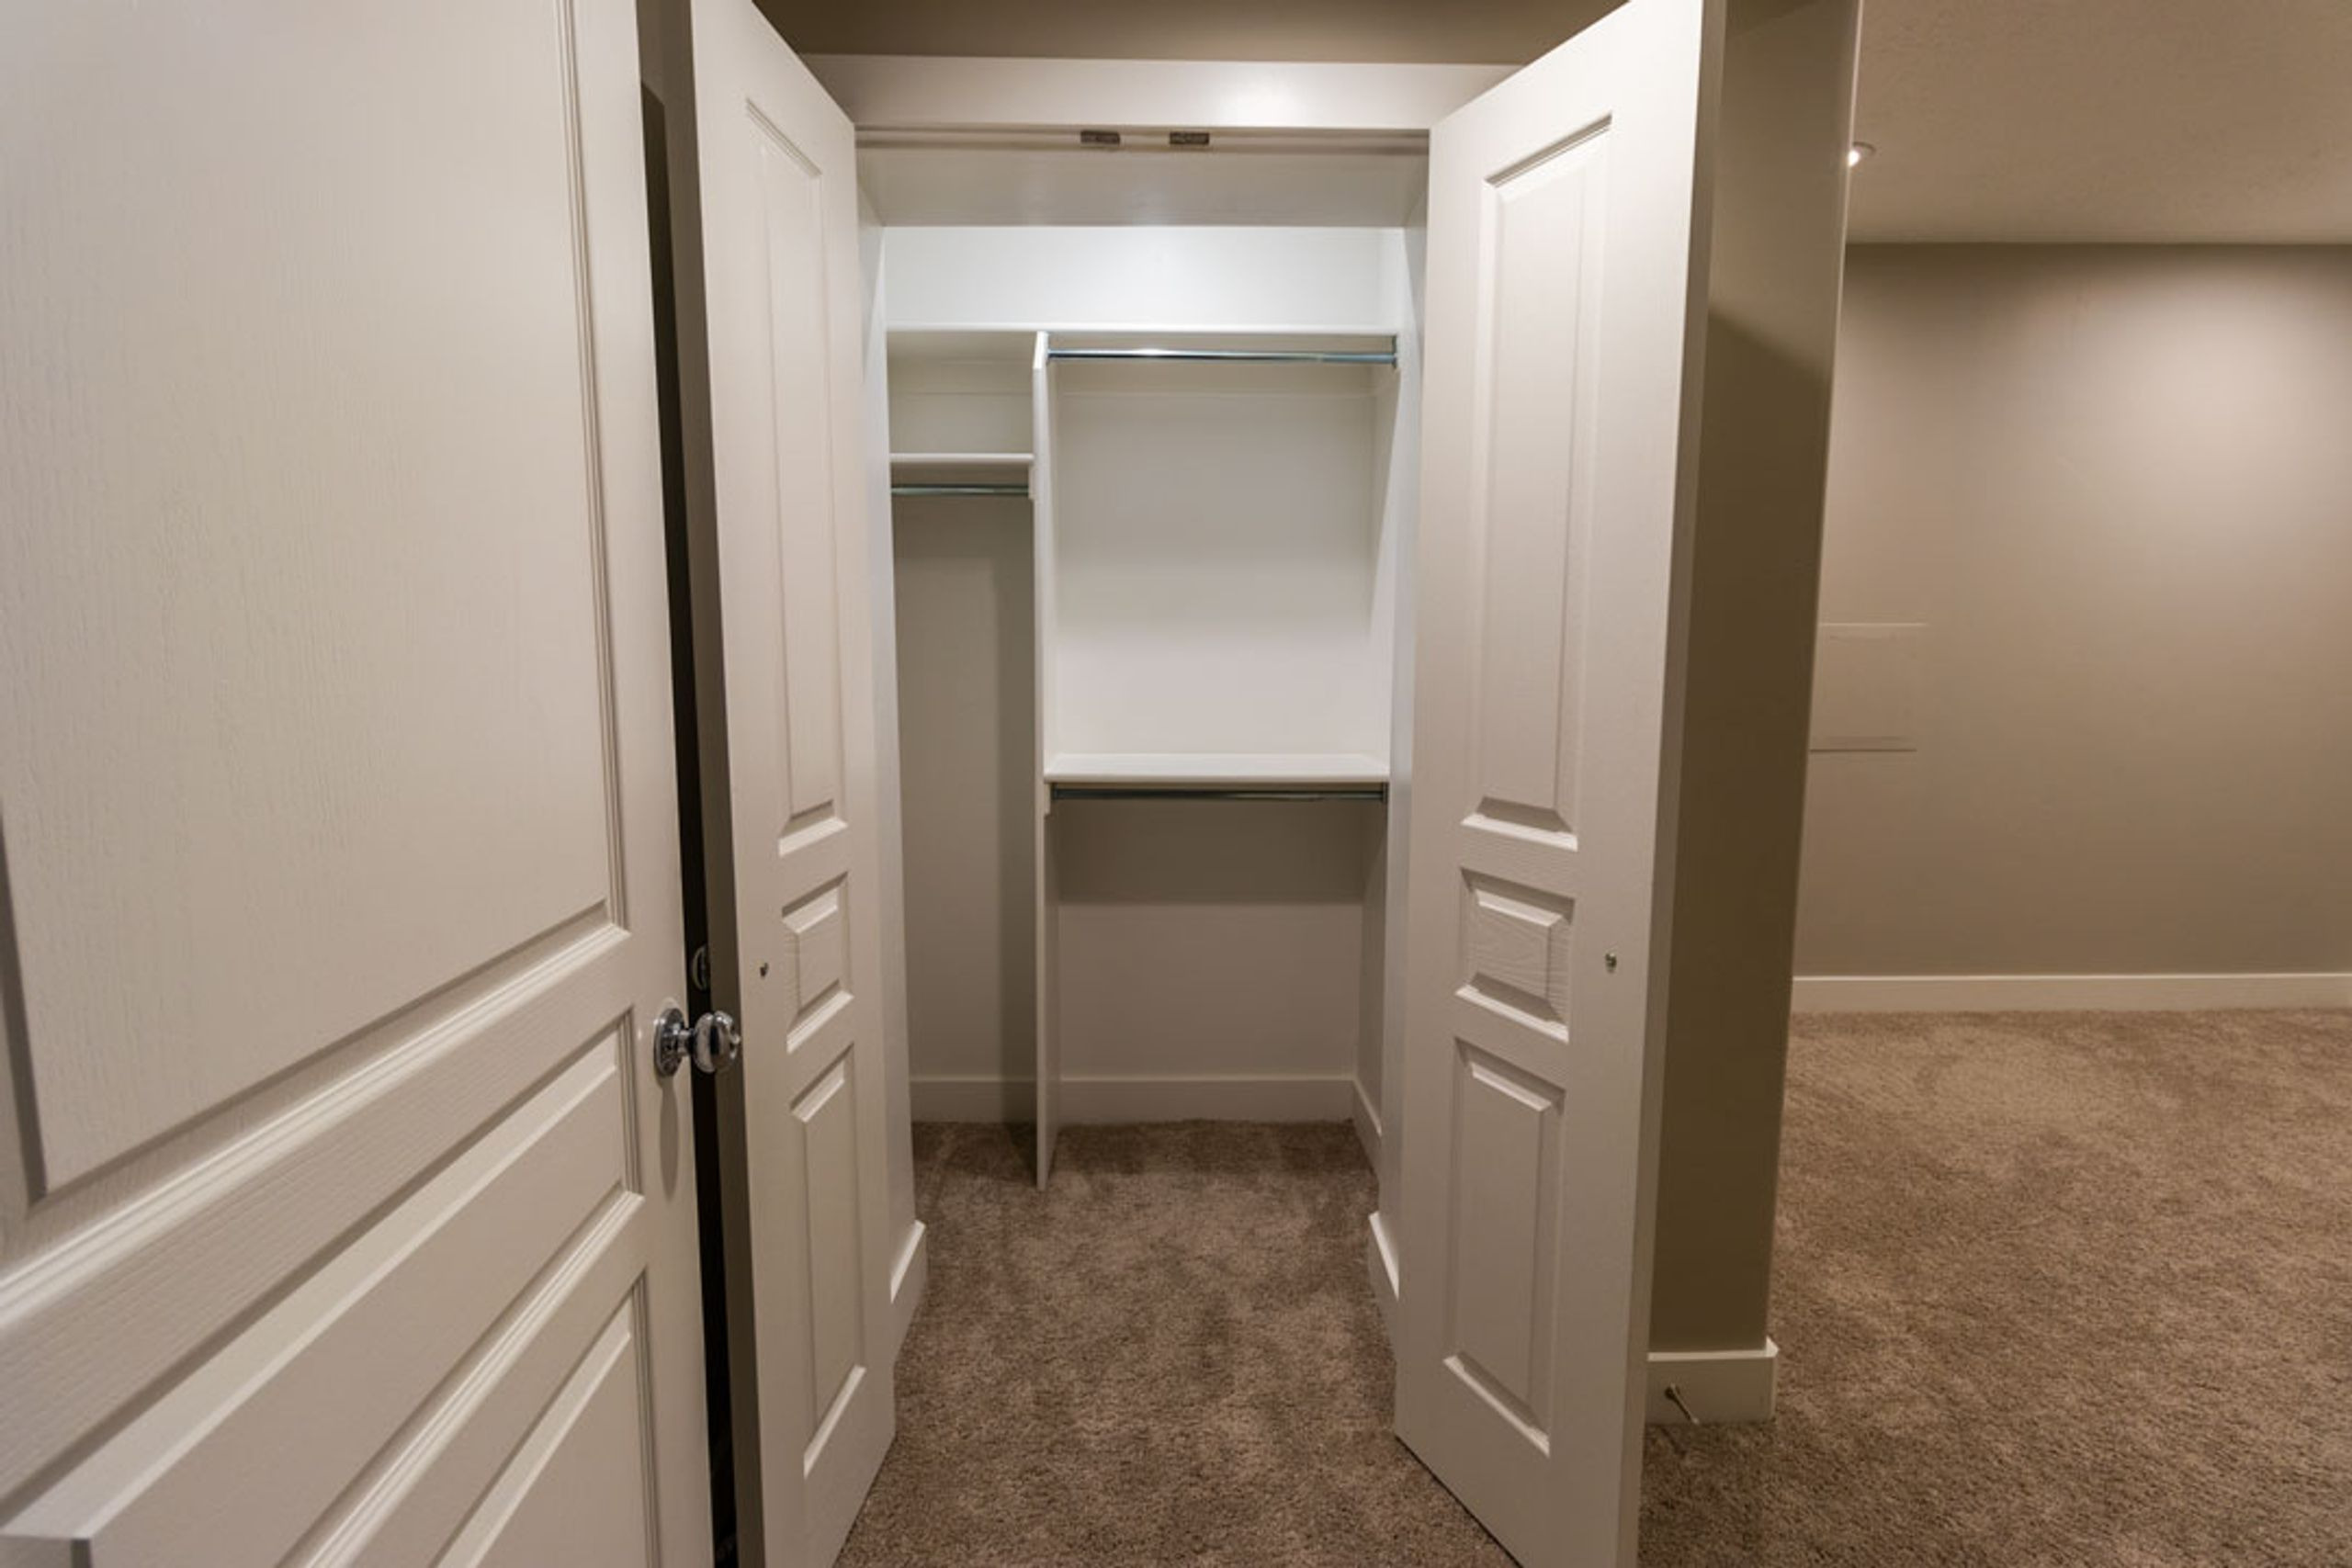 10x11 Basement self storage unit